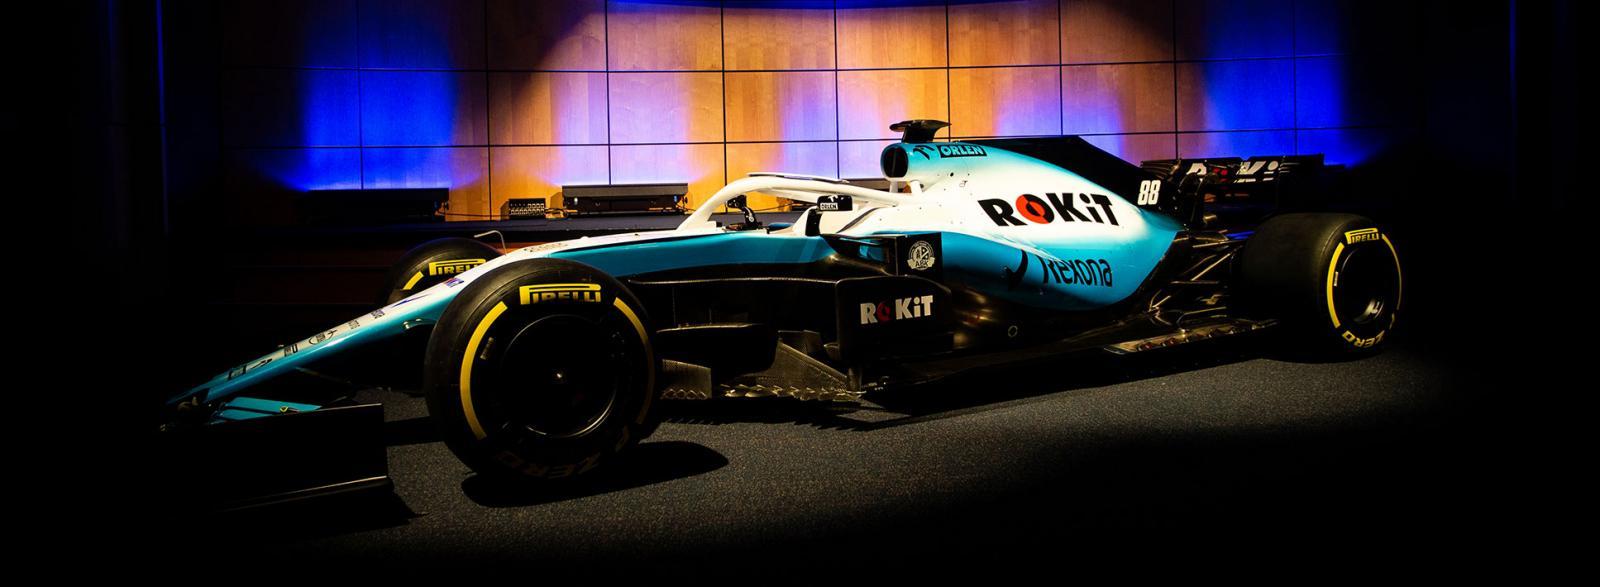 williams-f1-2019-car